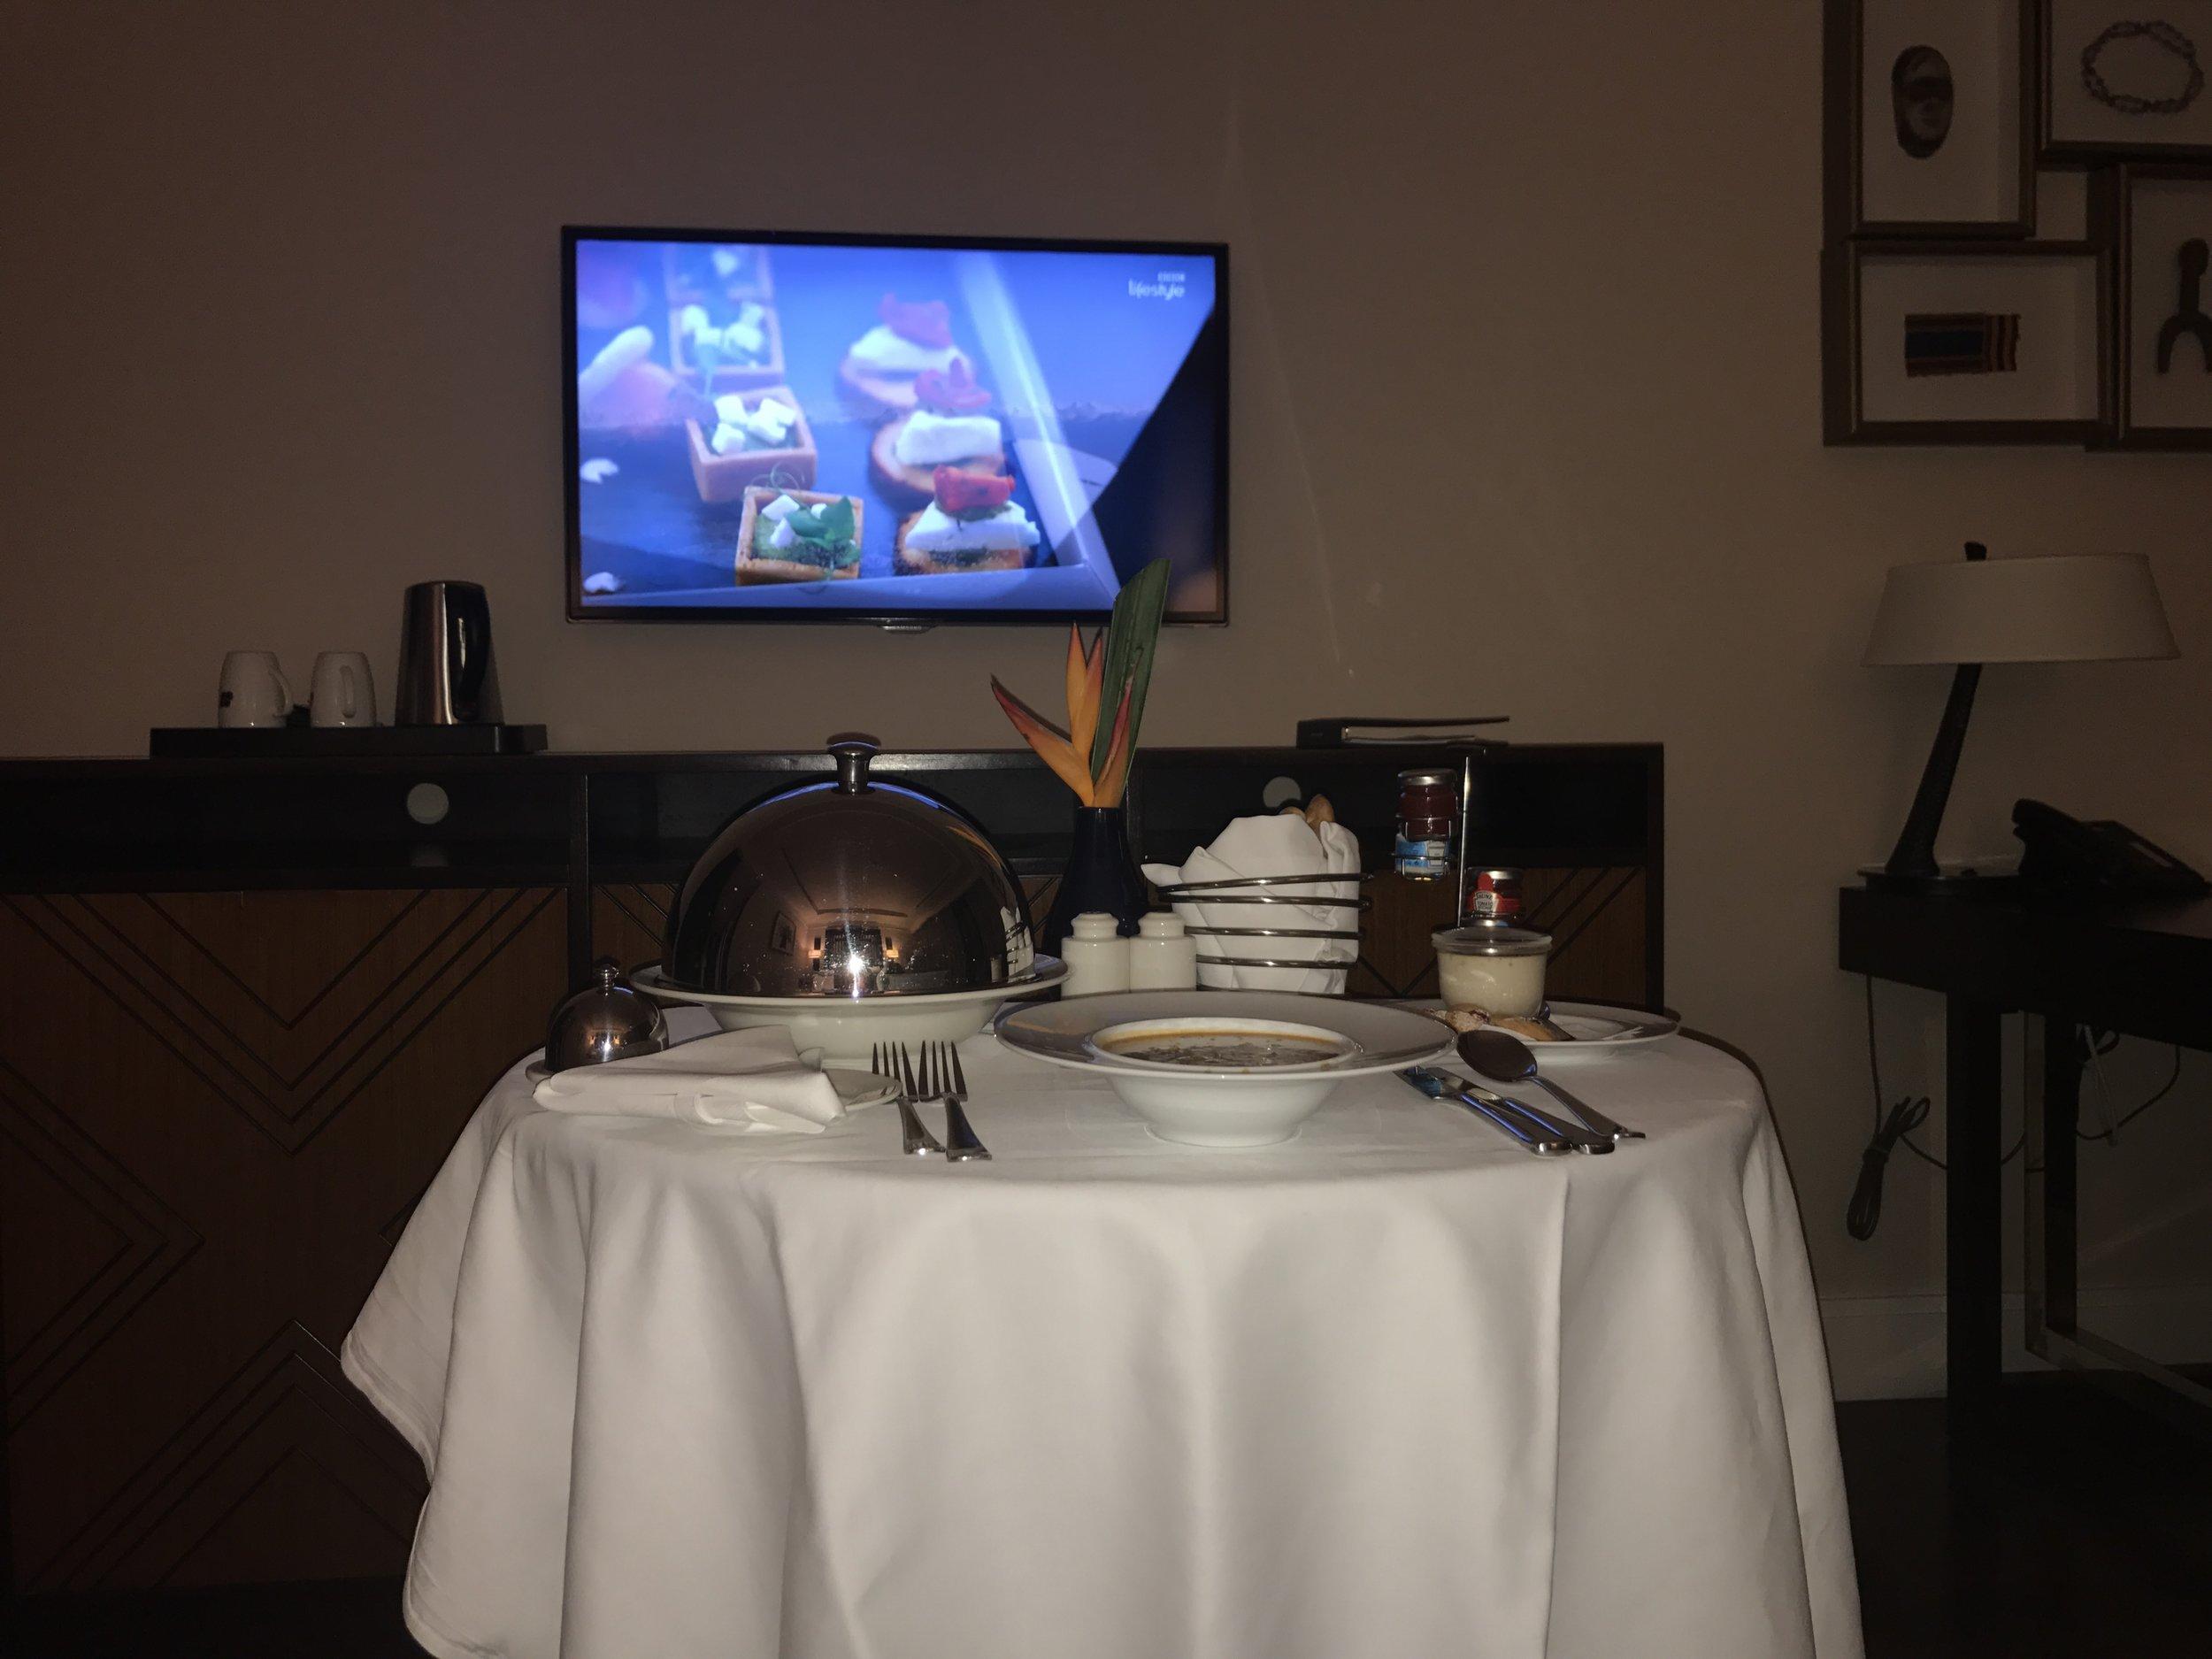 Kempinski-Goldcoast-Accra-Hotel-Review-Photos-vickieremoeofficial19.JPG